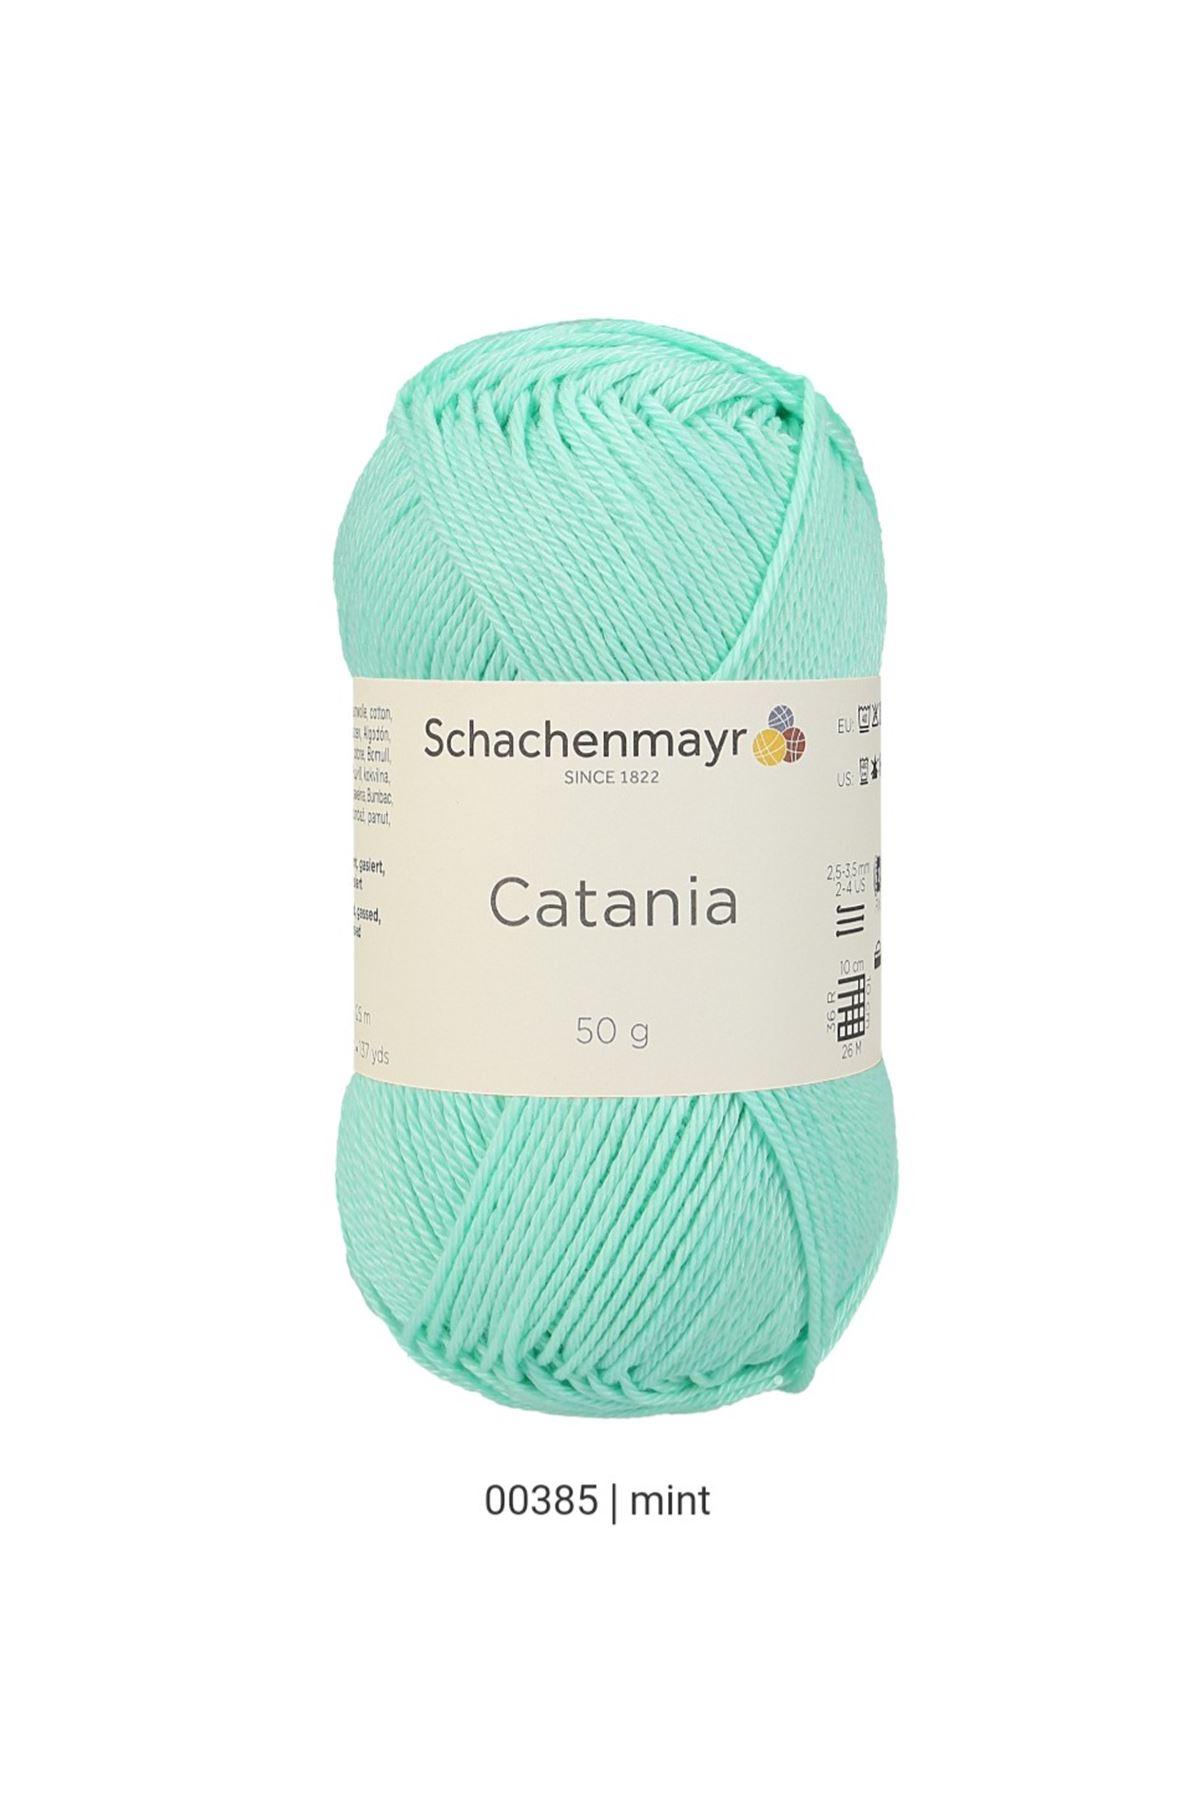 SMC Catania 50g 00385 Mint